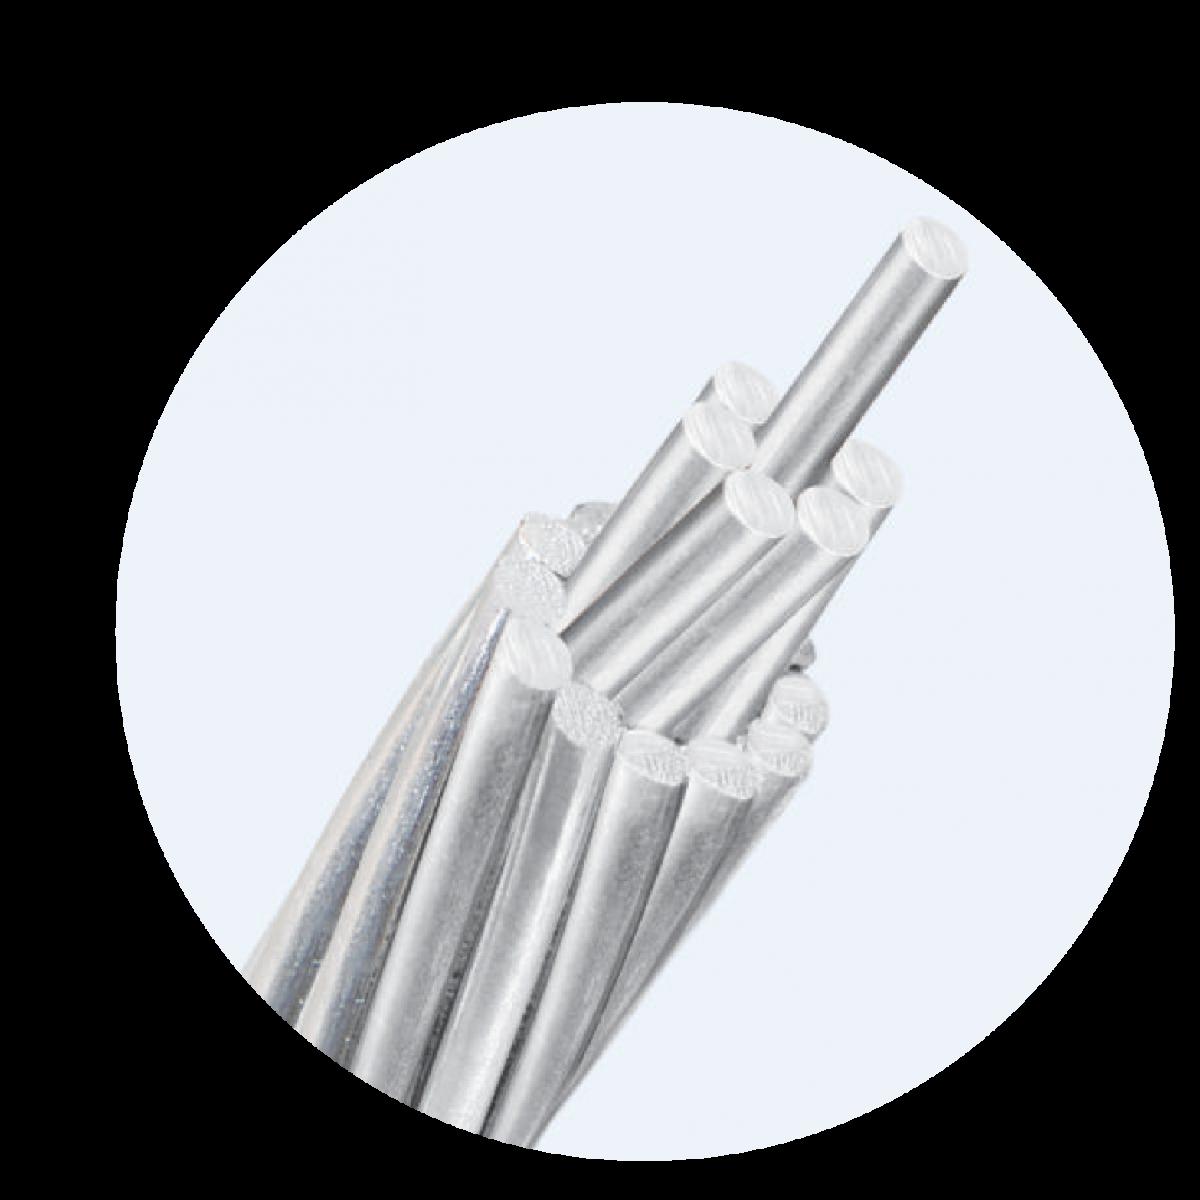 Twisted galvanized steel wire